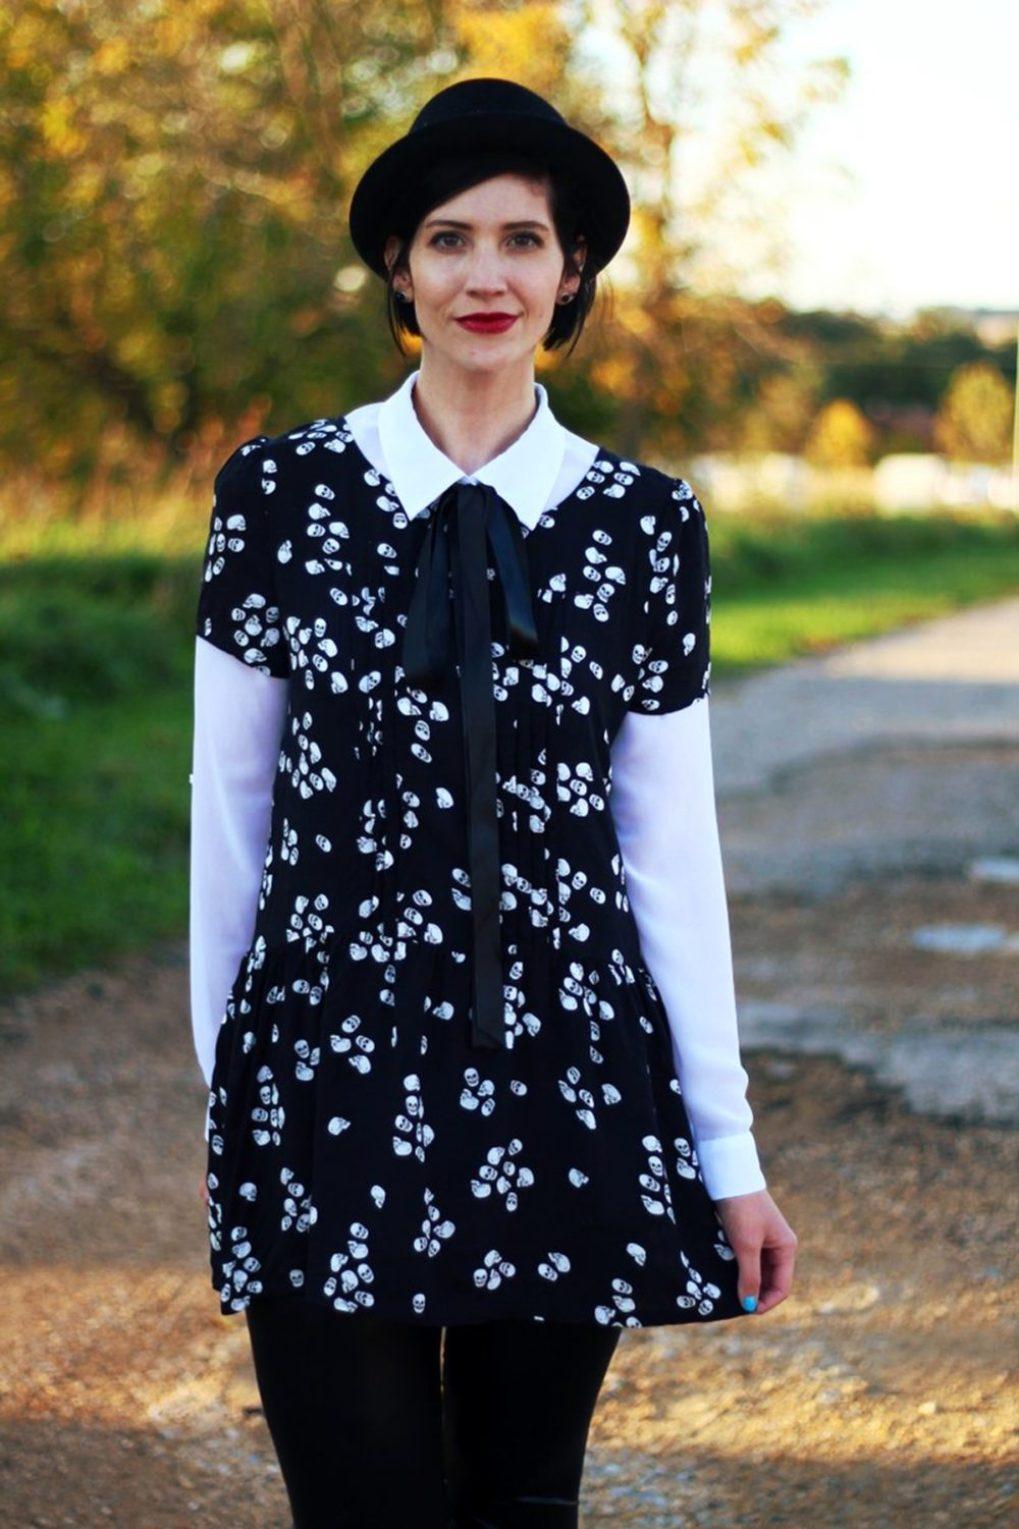 Outfit: Skull and crossbone dress, white button down, DIY ribbon, pork pie hat, dark lipstick